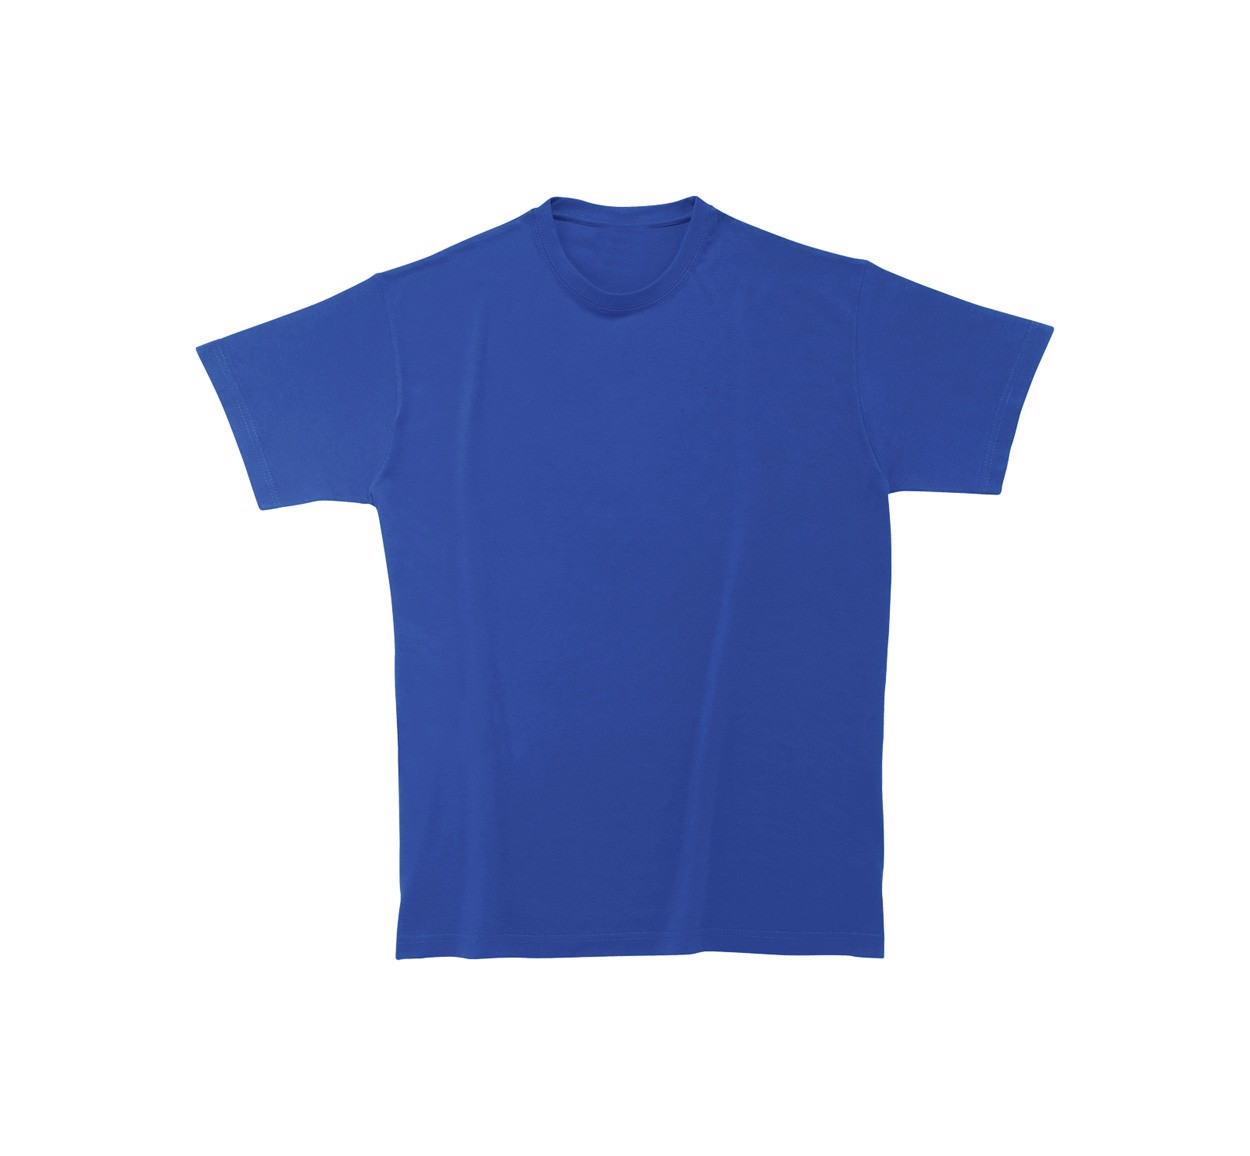 Tričko Pro Děti HC Junior - Modrá / XS